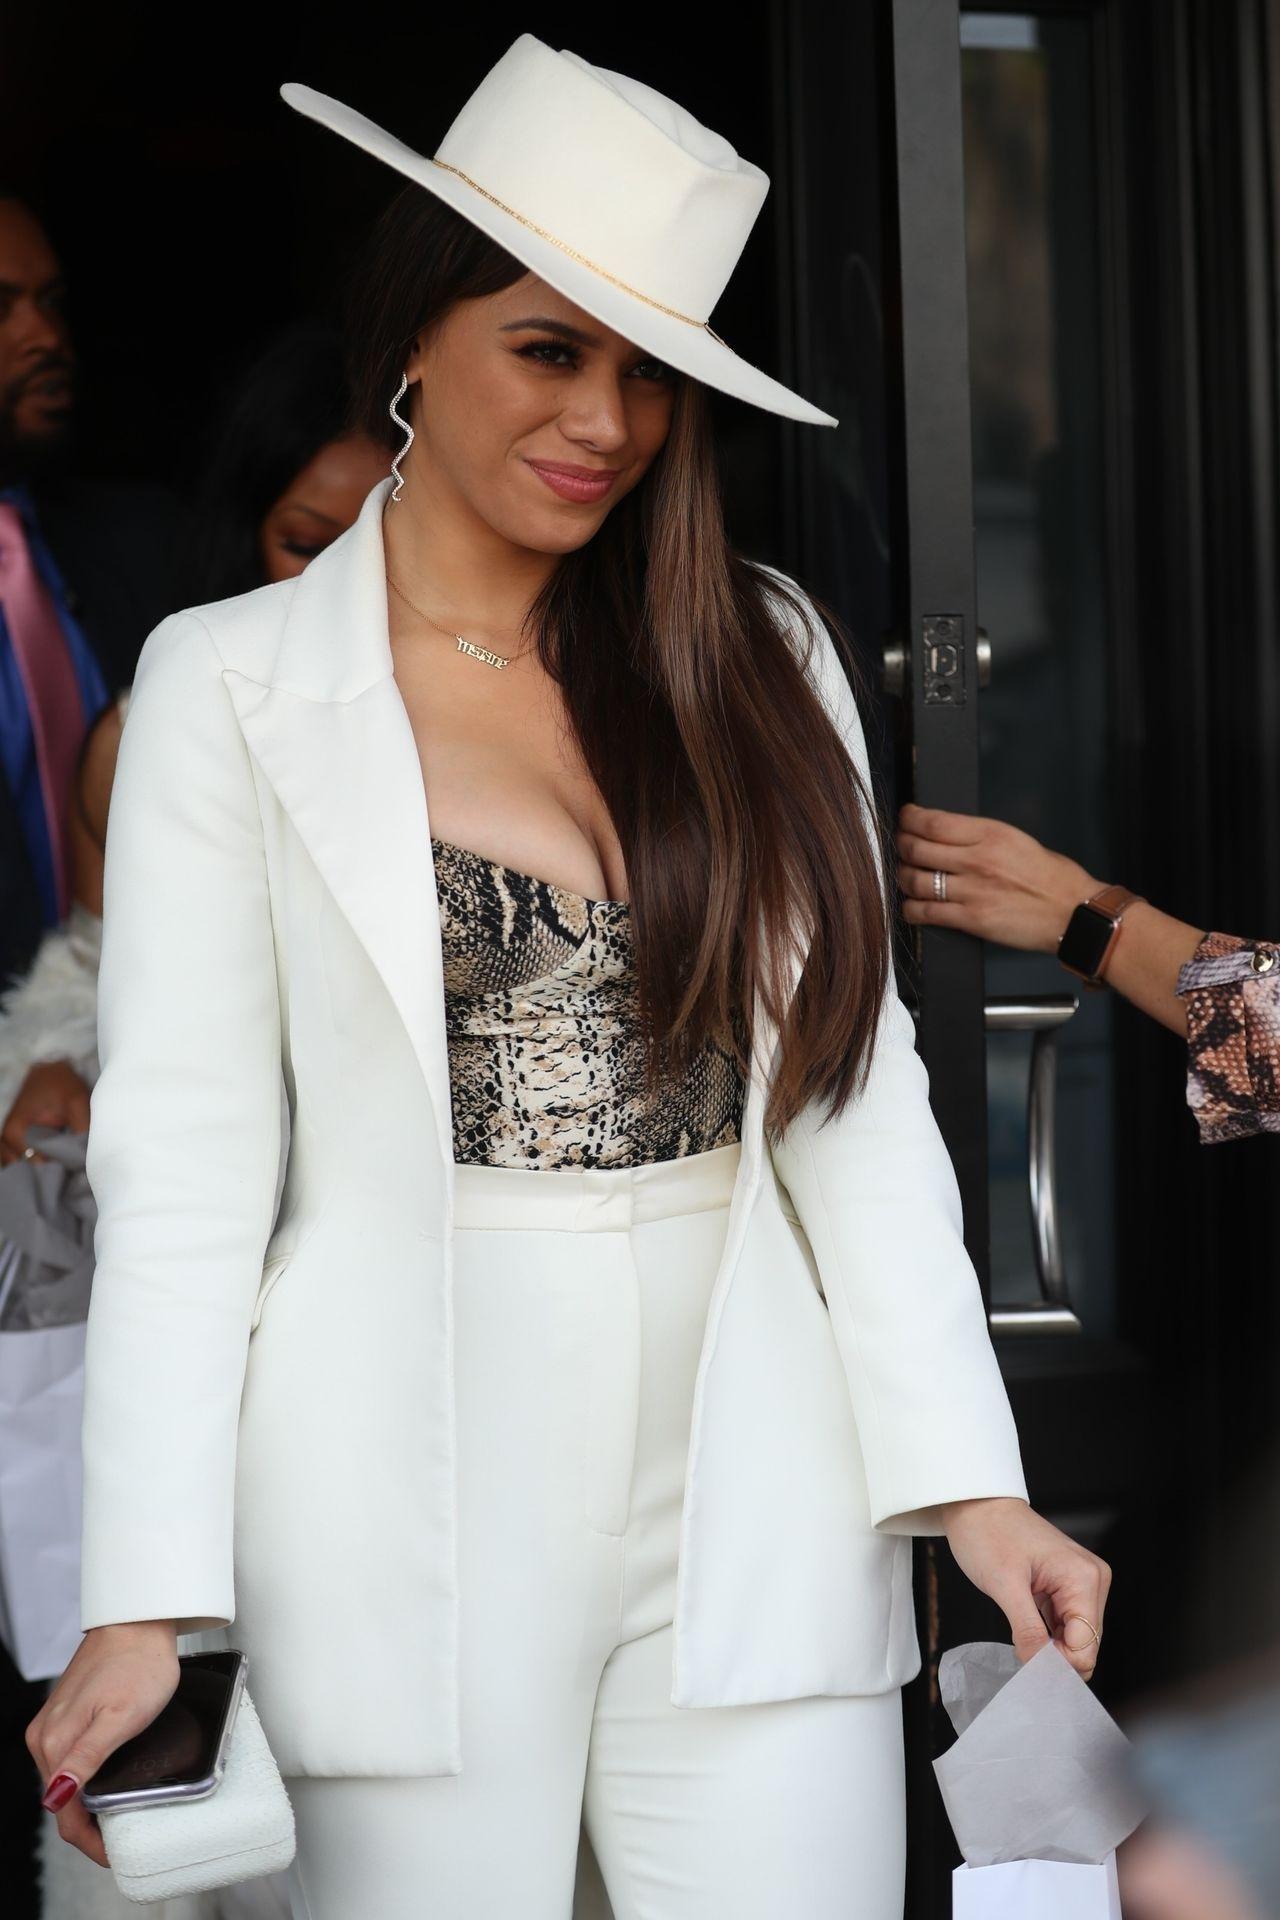 Dinah Jane Departs The Women In Harmony Pre Grammy Luncheon 0028